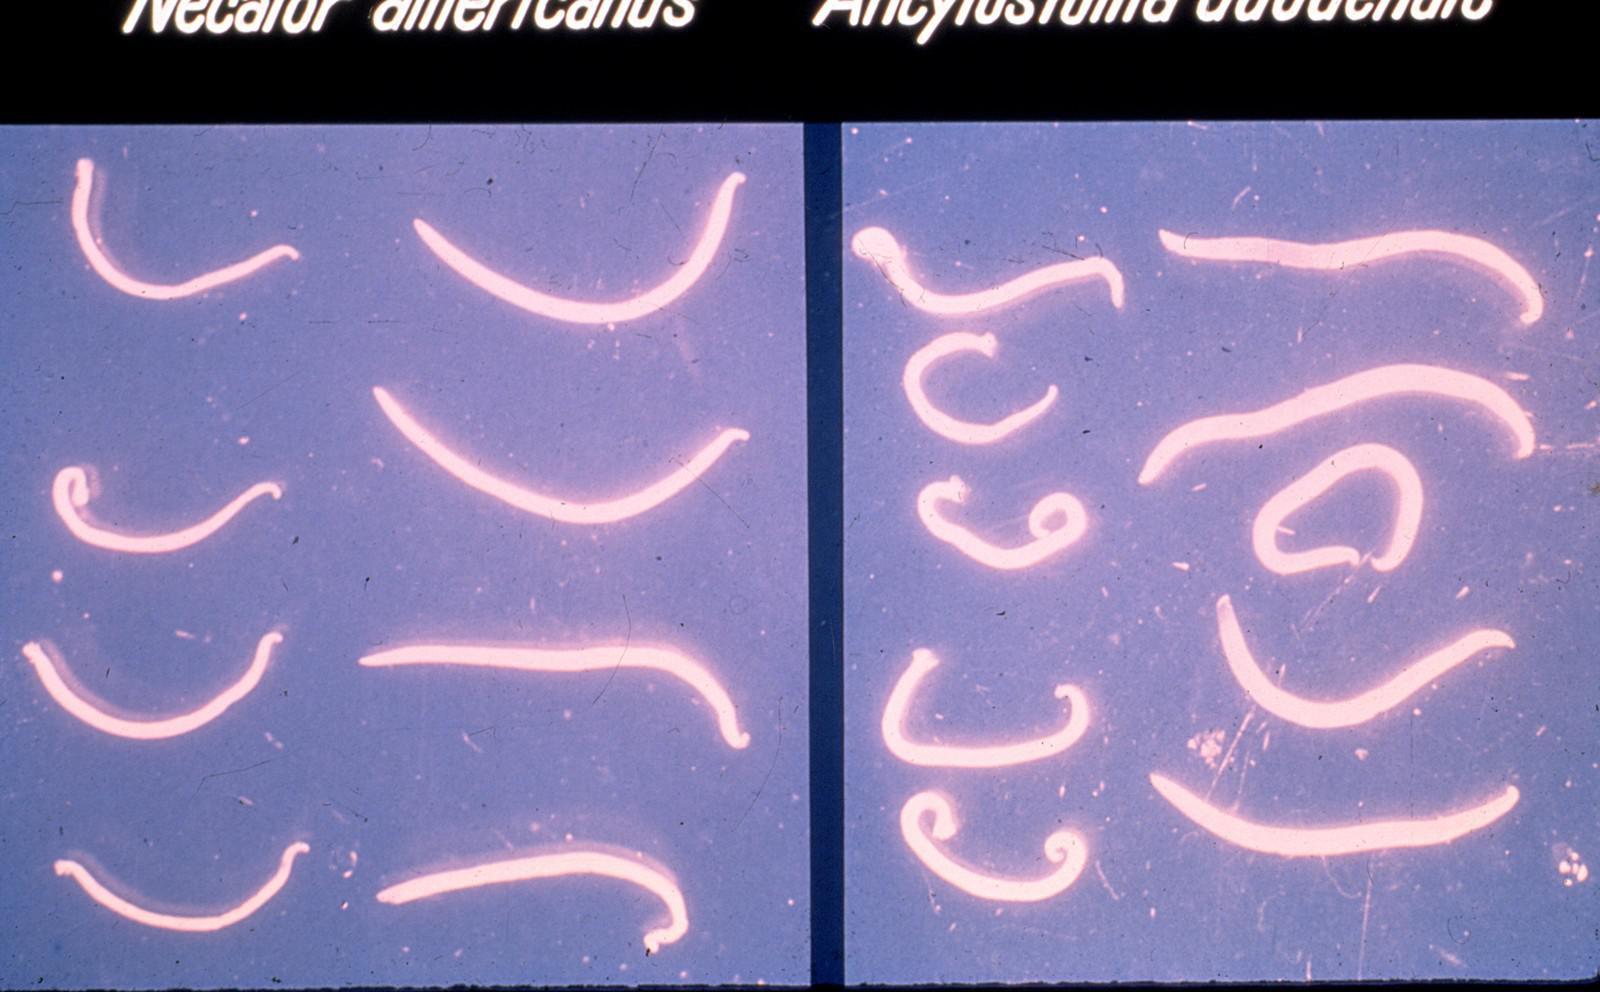 Terdapat dua jenis cacing tambang yakni Necator americanus (kiri) dan Ancylostoma duodenale